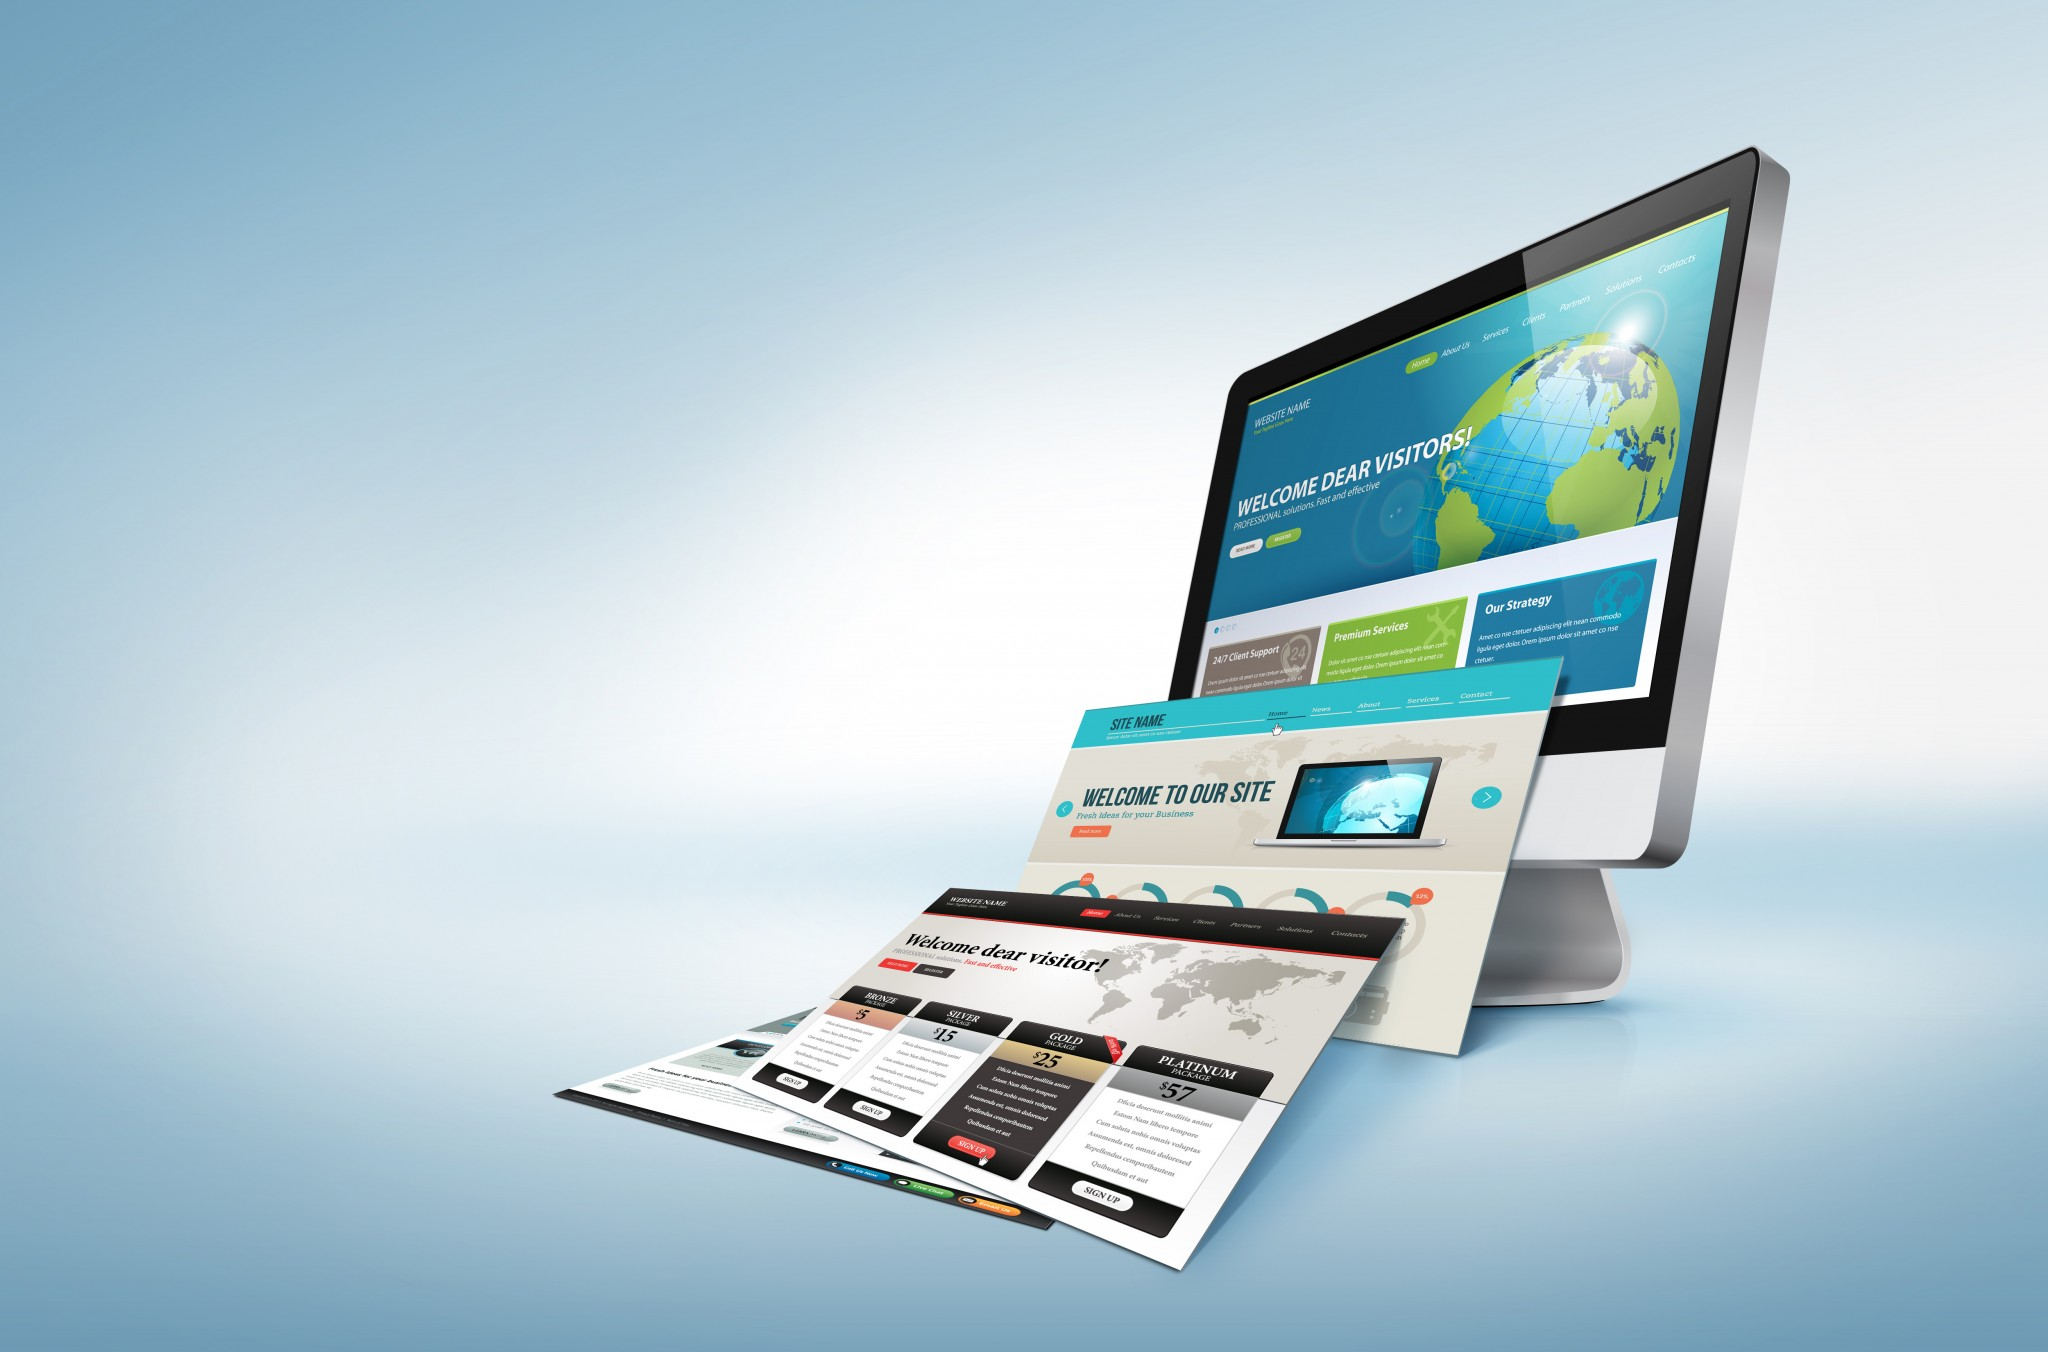 shutterstock-website